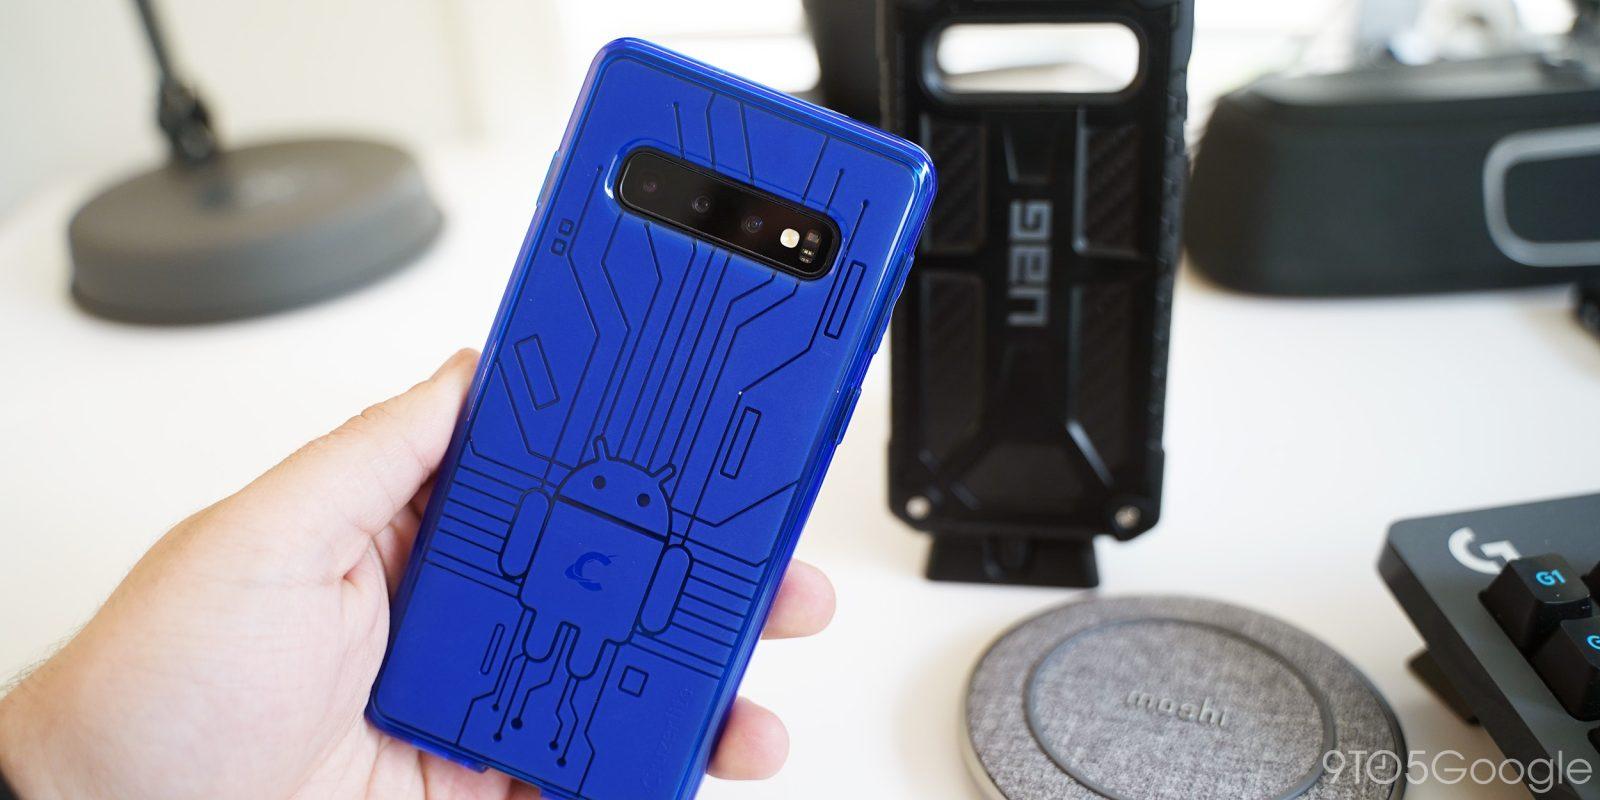 Galaxy S10 Starter Kit: Some handy accessories [Video